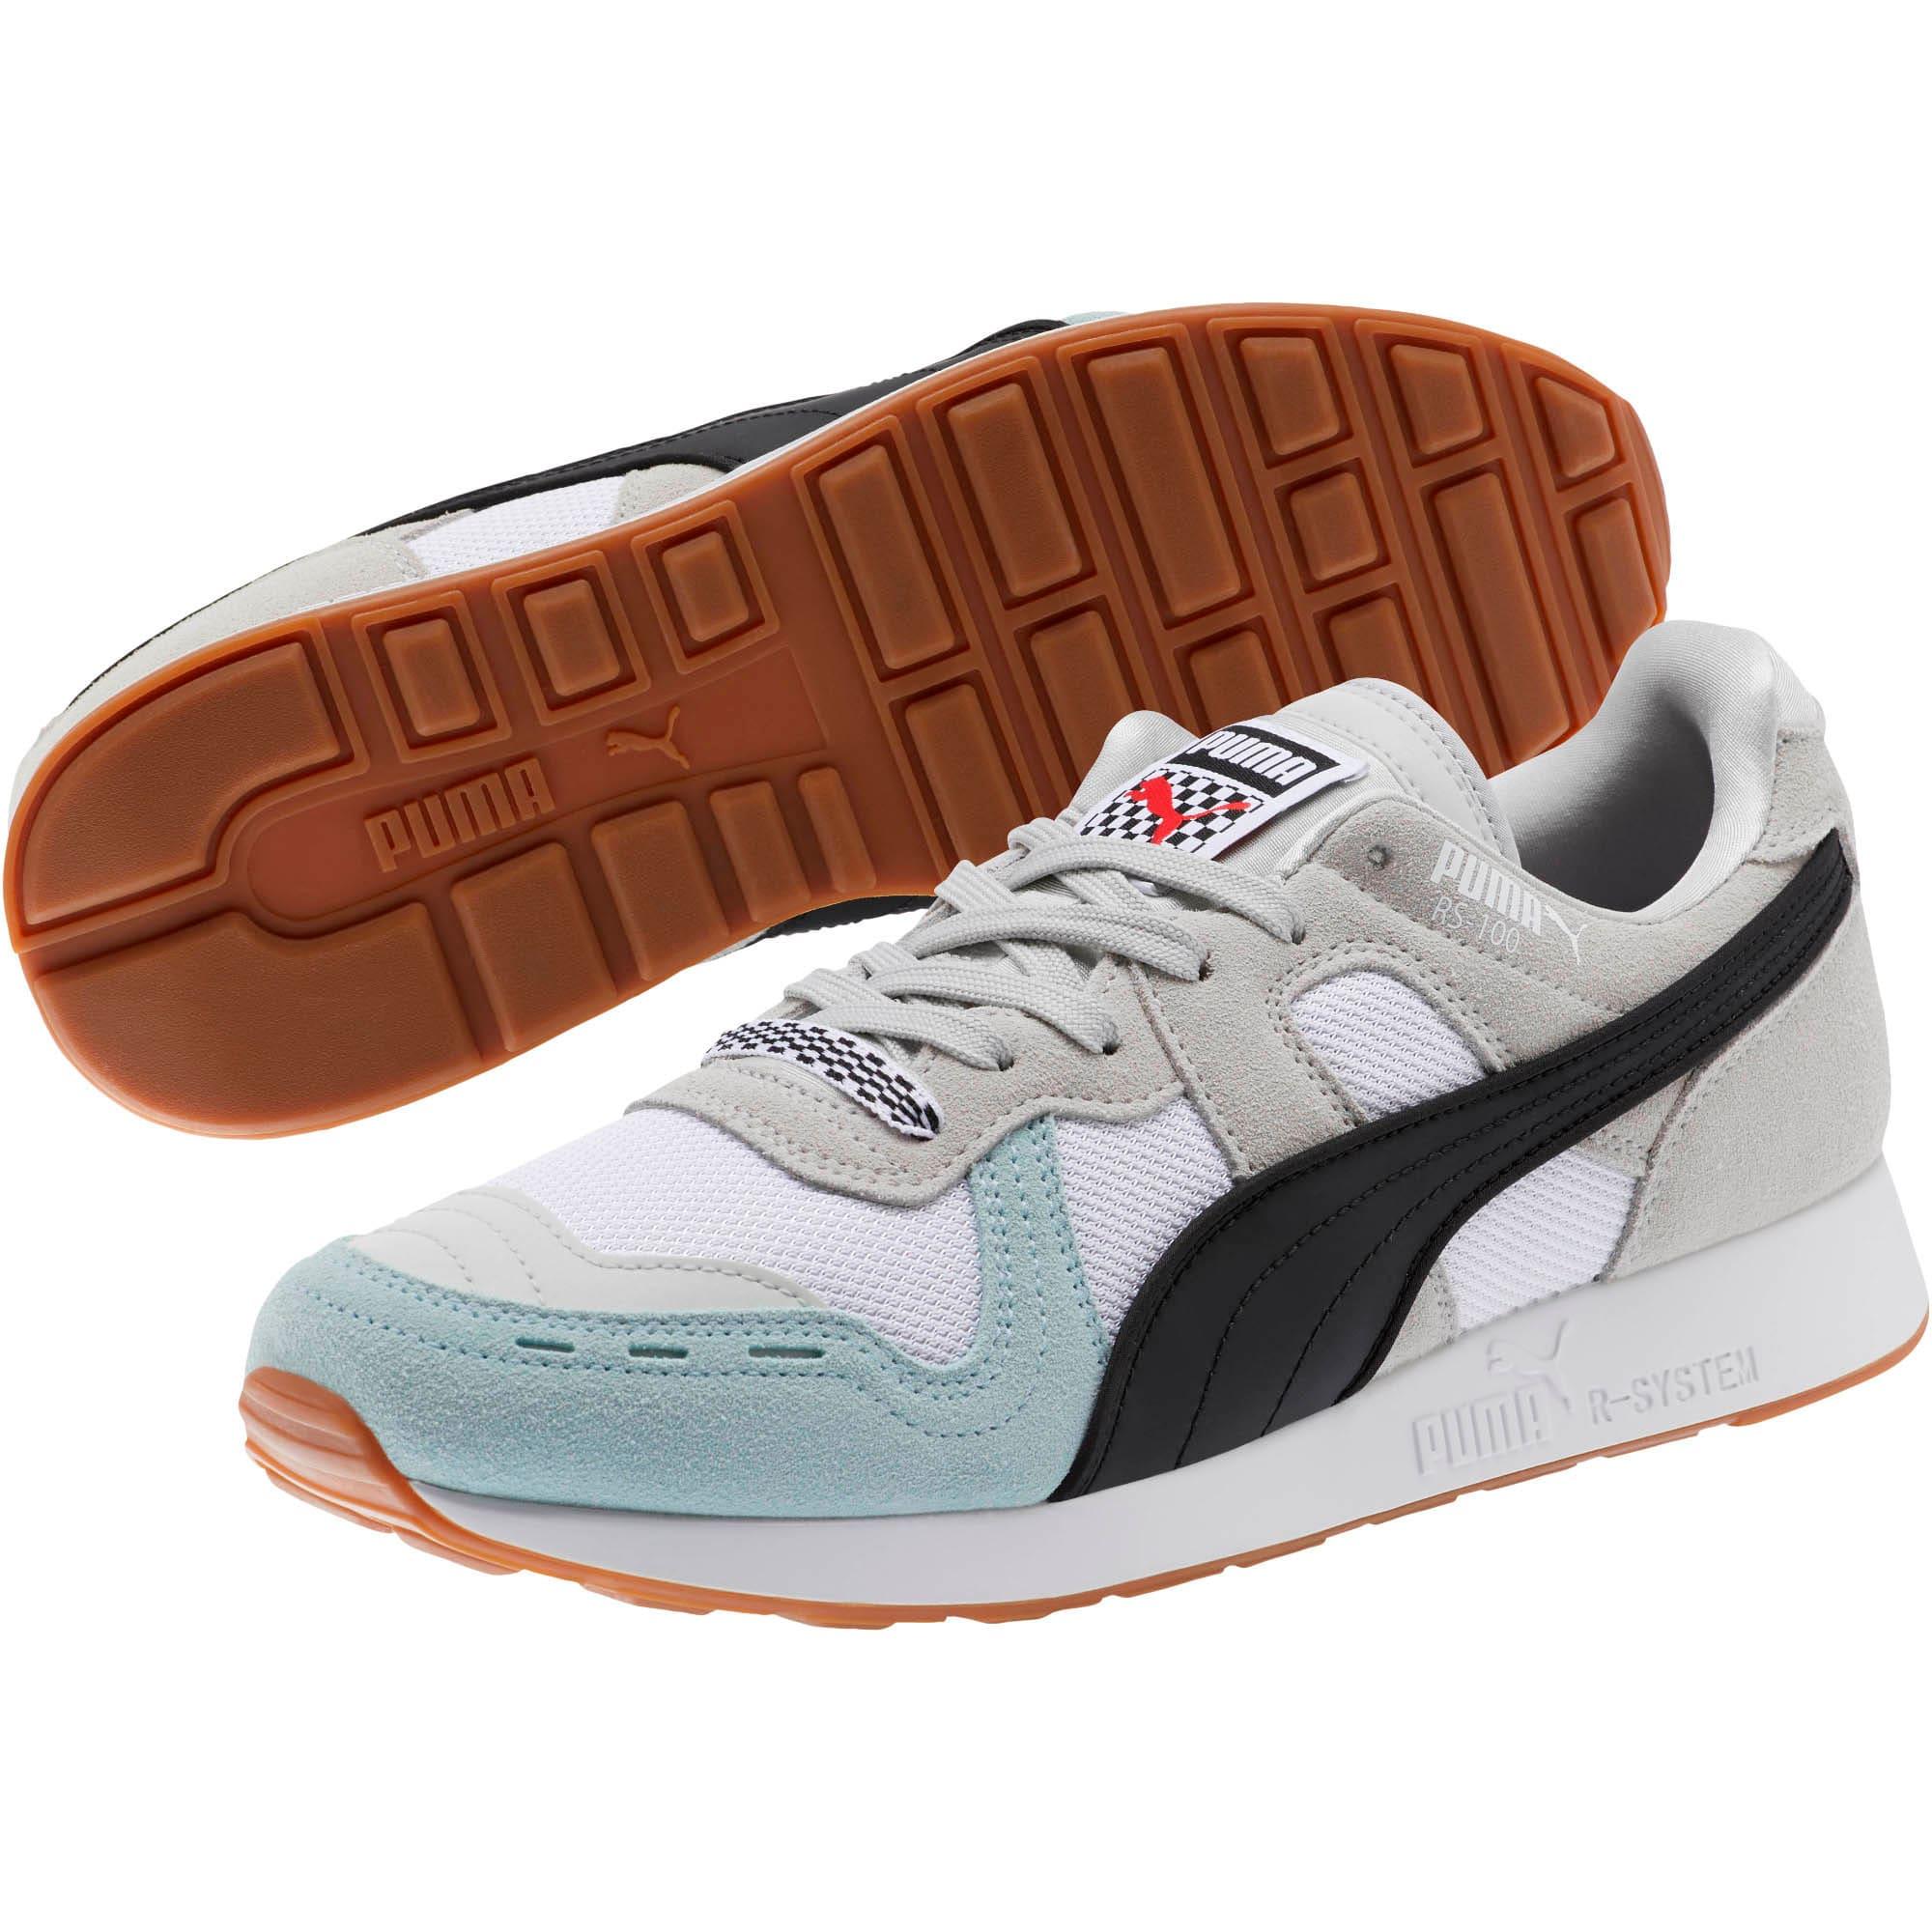 Miniatura 2 de Zapatos deportivos RS-100 Racing Flag, Glacier Gray-Puma White, mediano